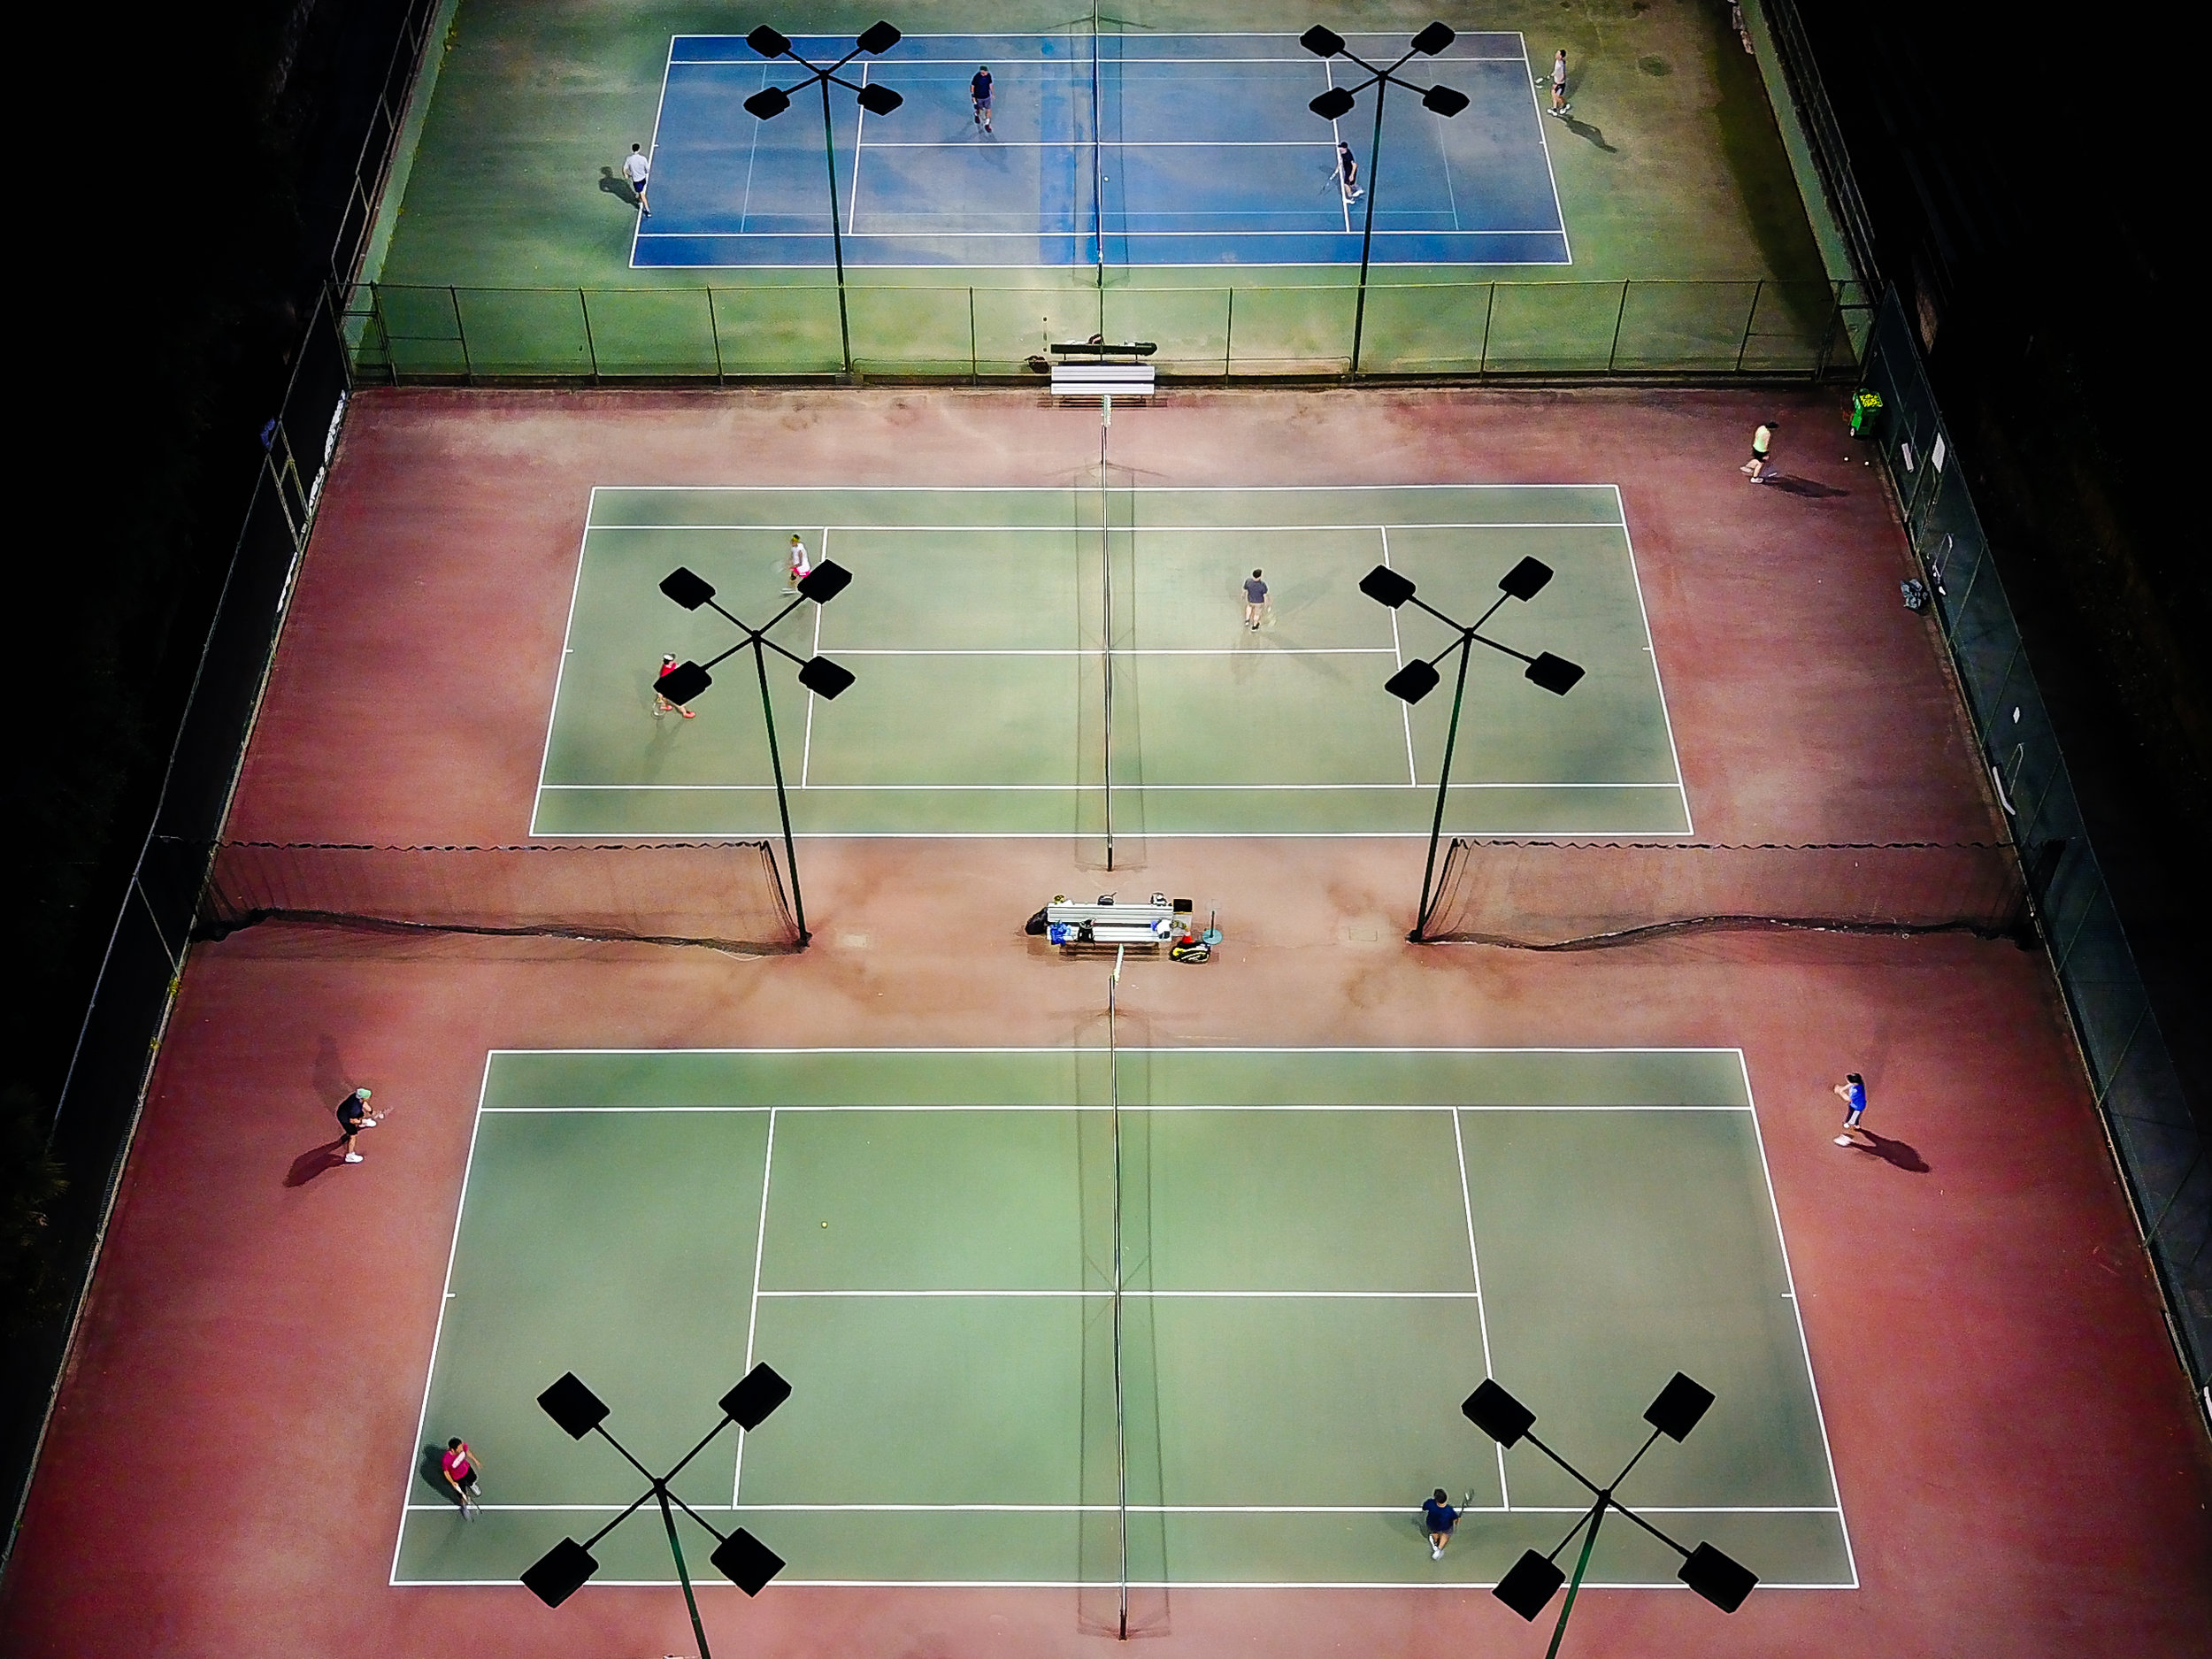 Tennis courts, Piedmont, California